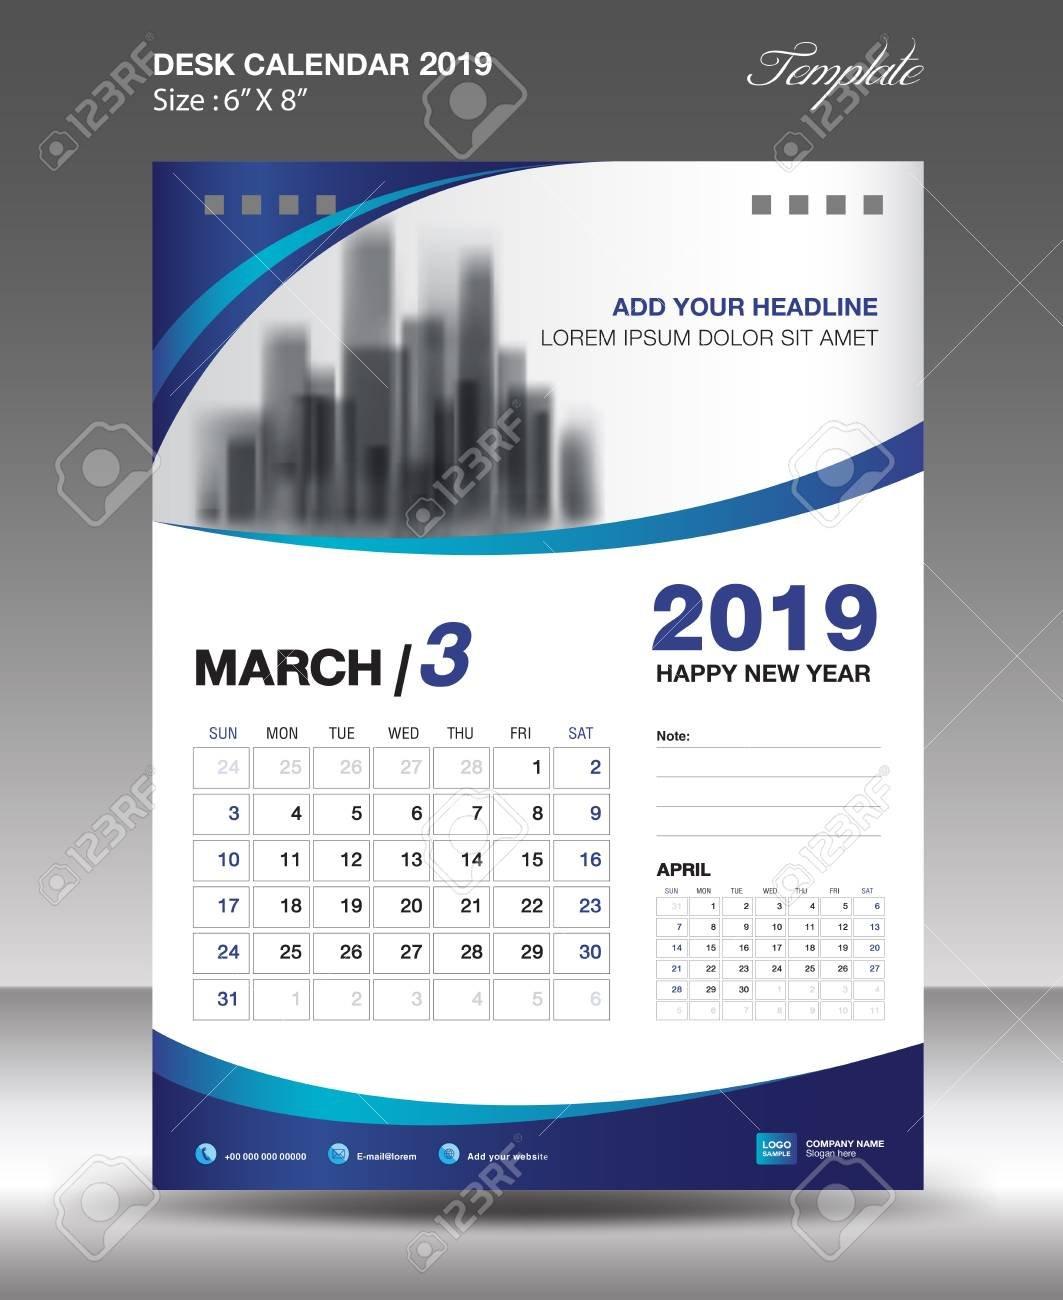 March Desk Calendar 2019 Template Flyer Design Vector Illustration Design A Calendar 2019